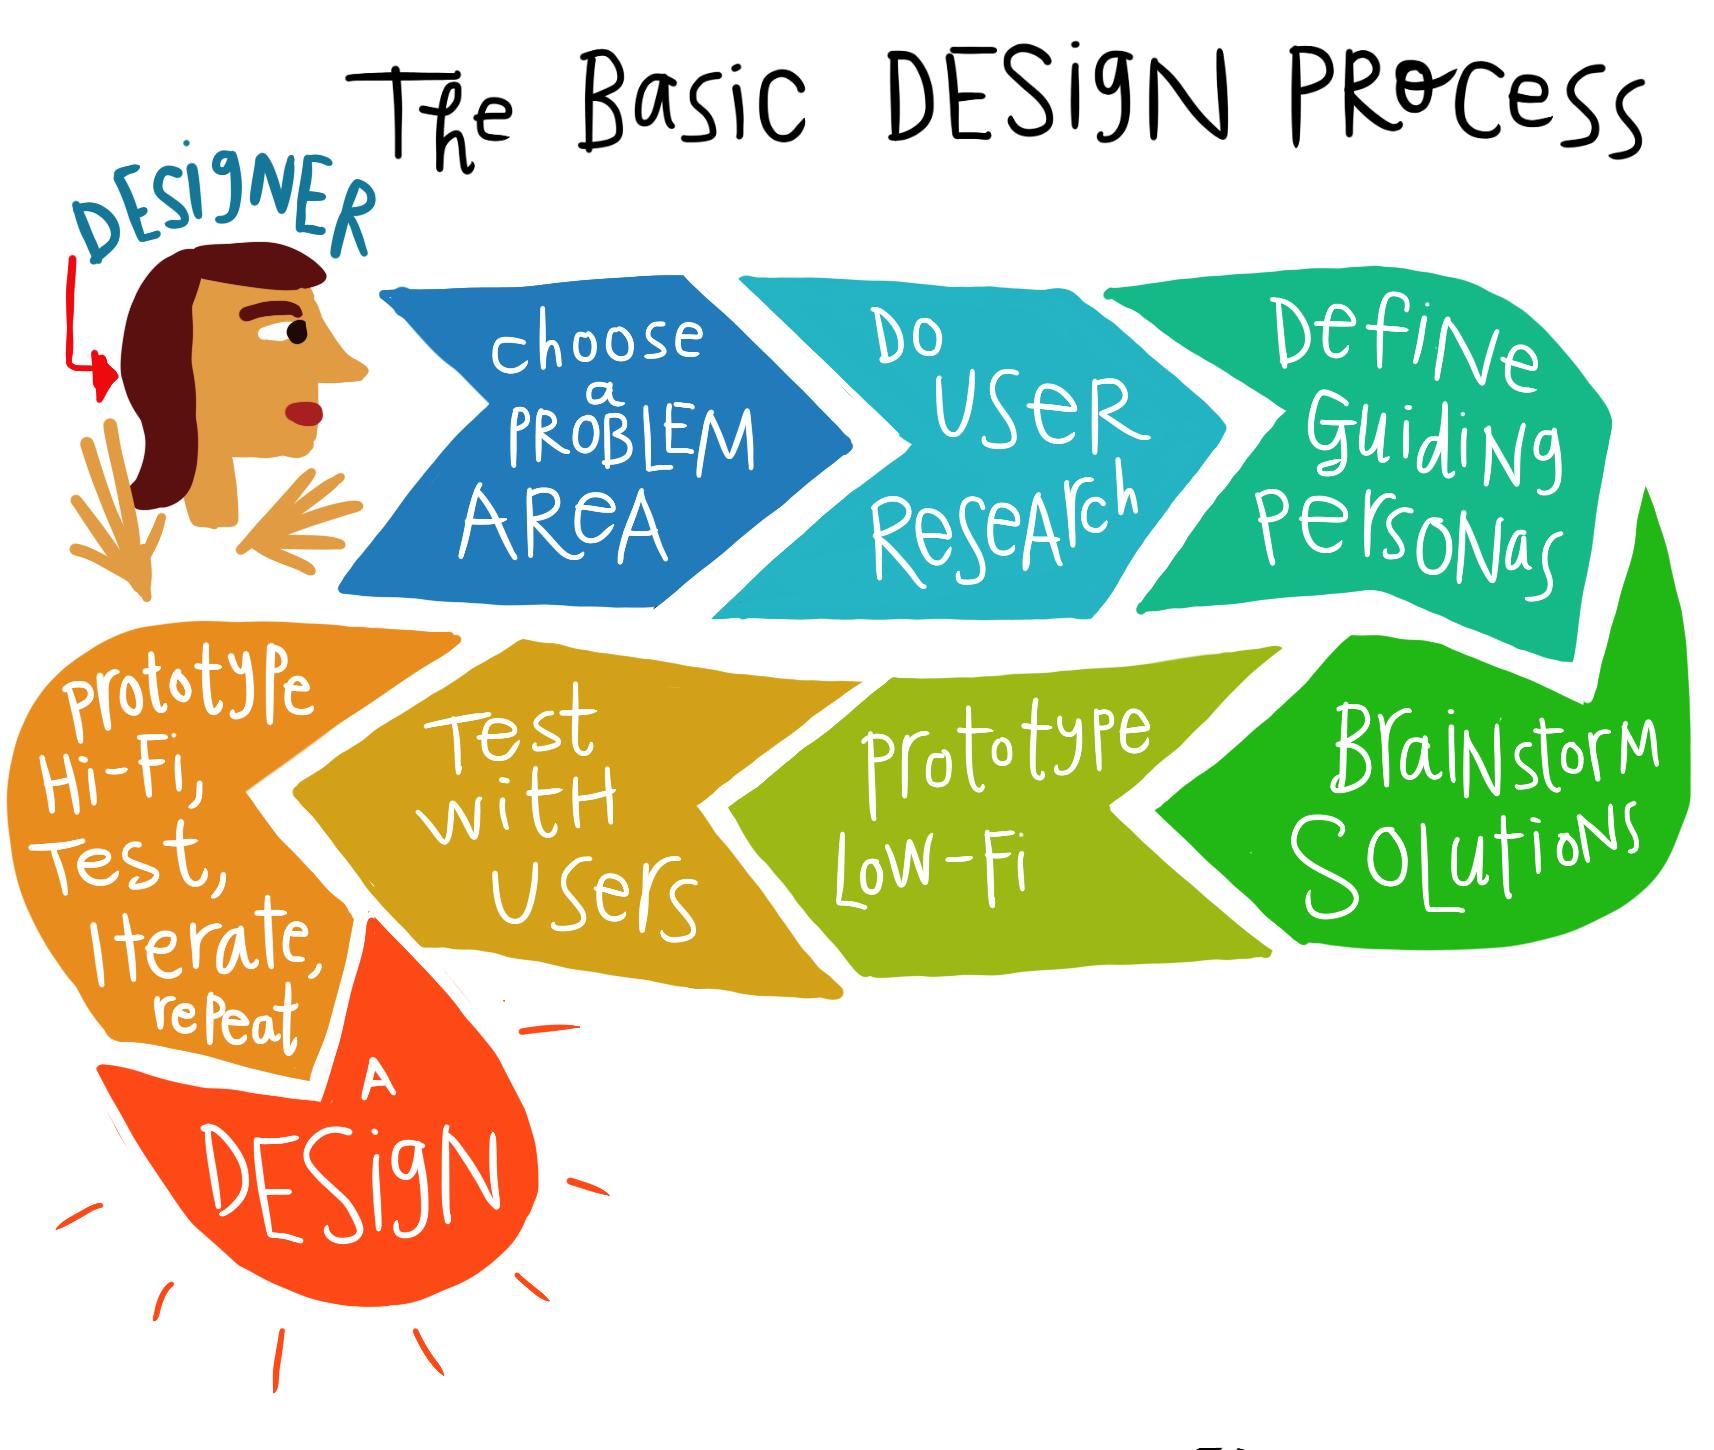 Website Design New Ideas: Our Web Design Process/Philosophy